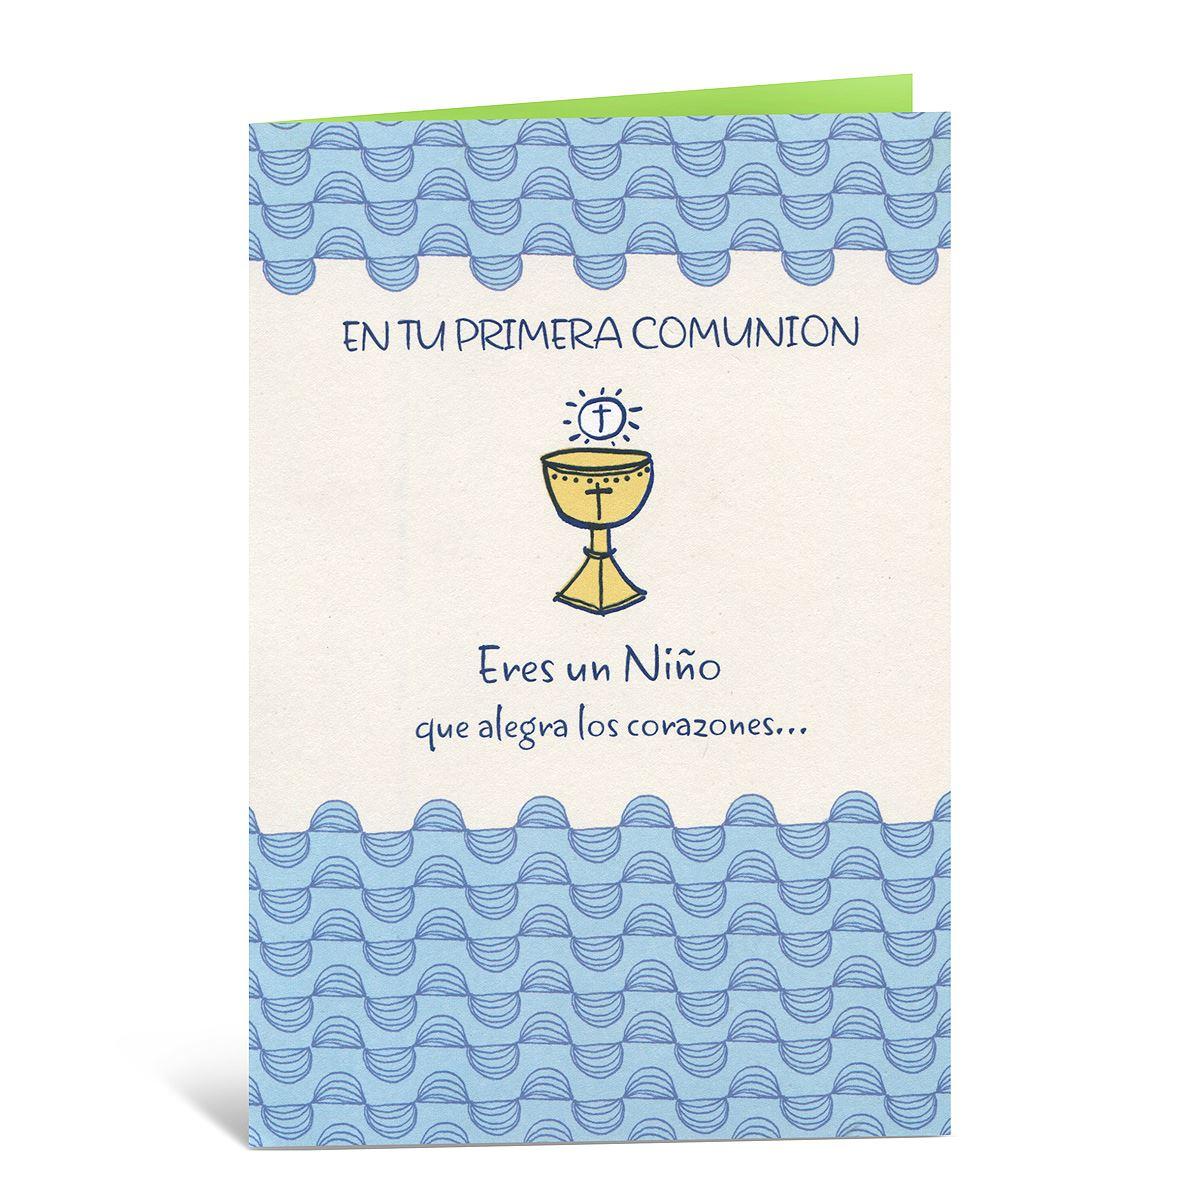 b6ce571cab4b5 Tarjeta primera comunion niño caliz dorado